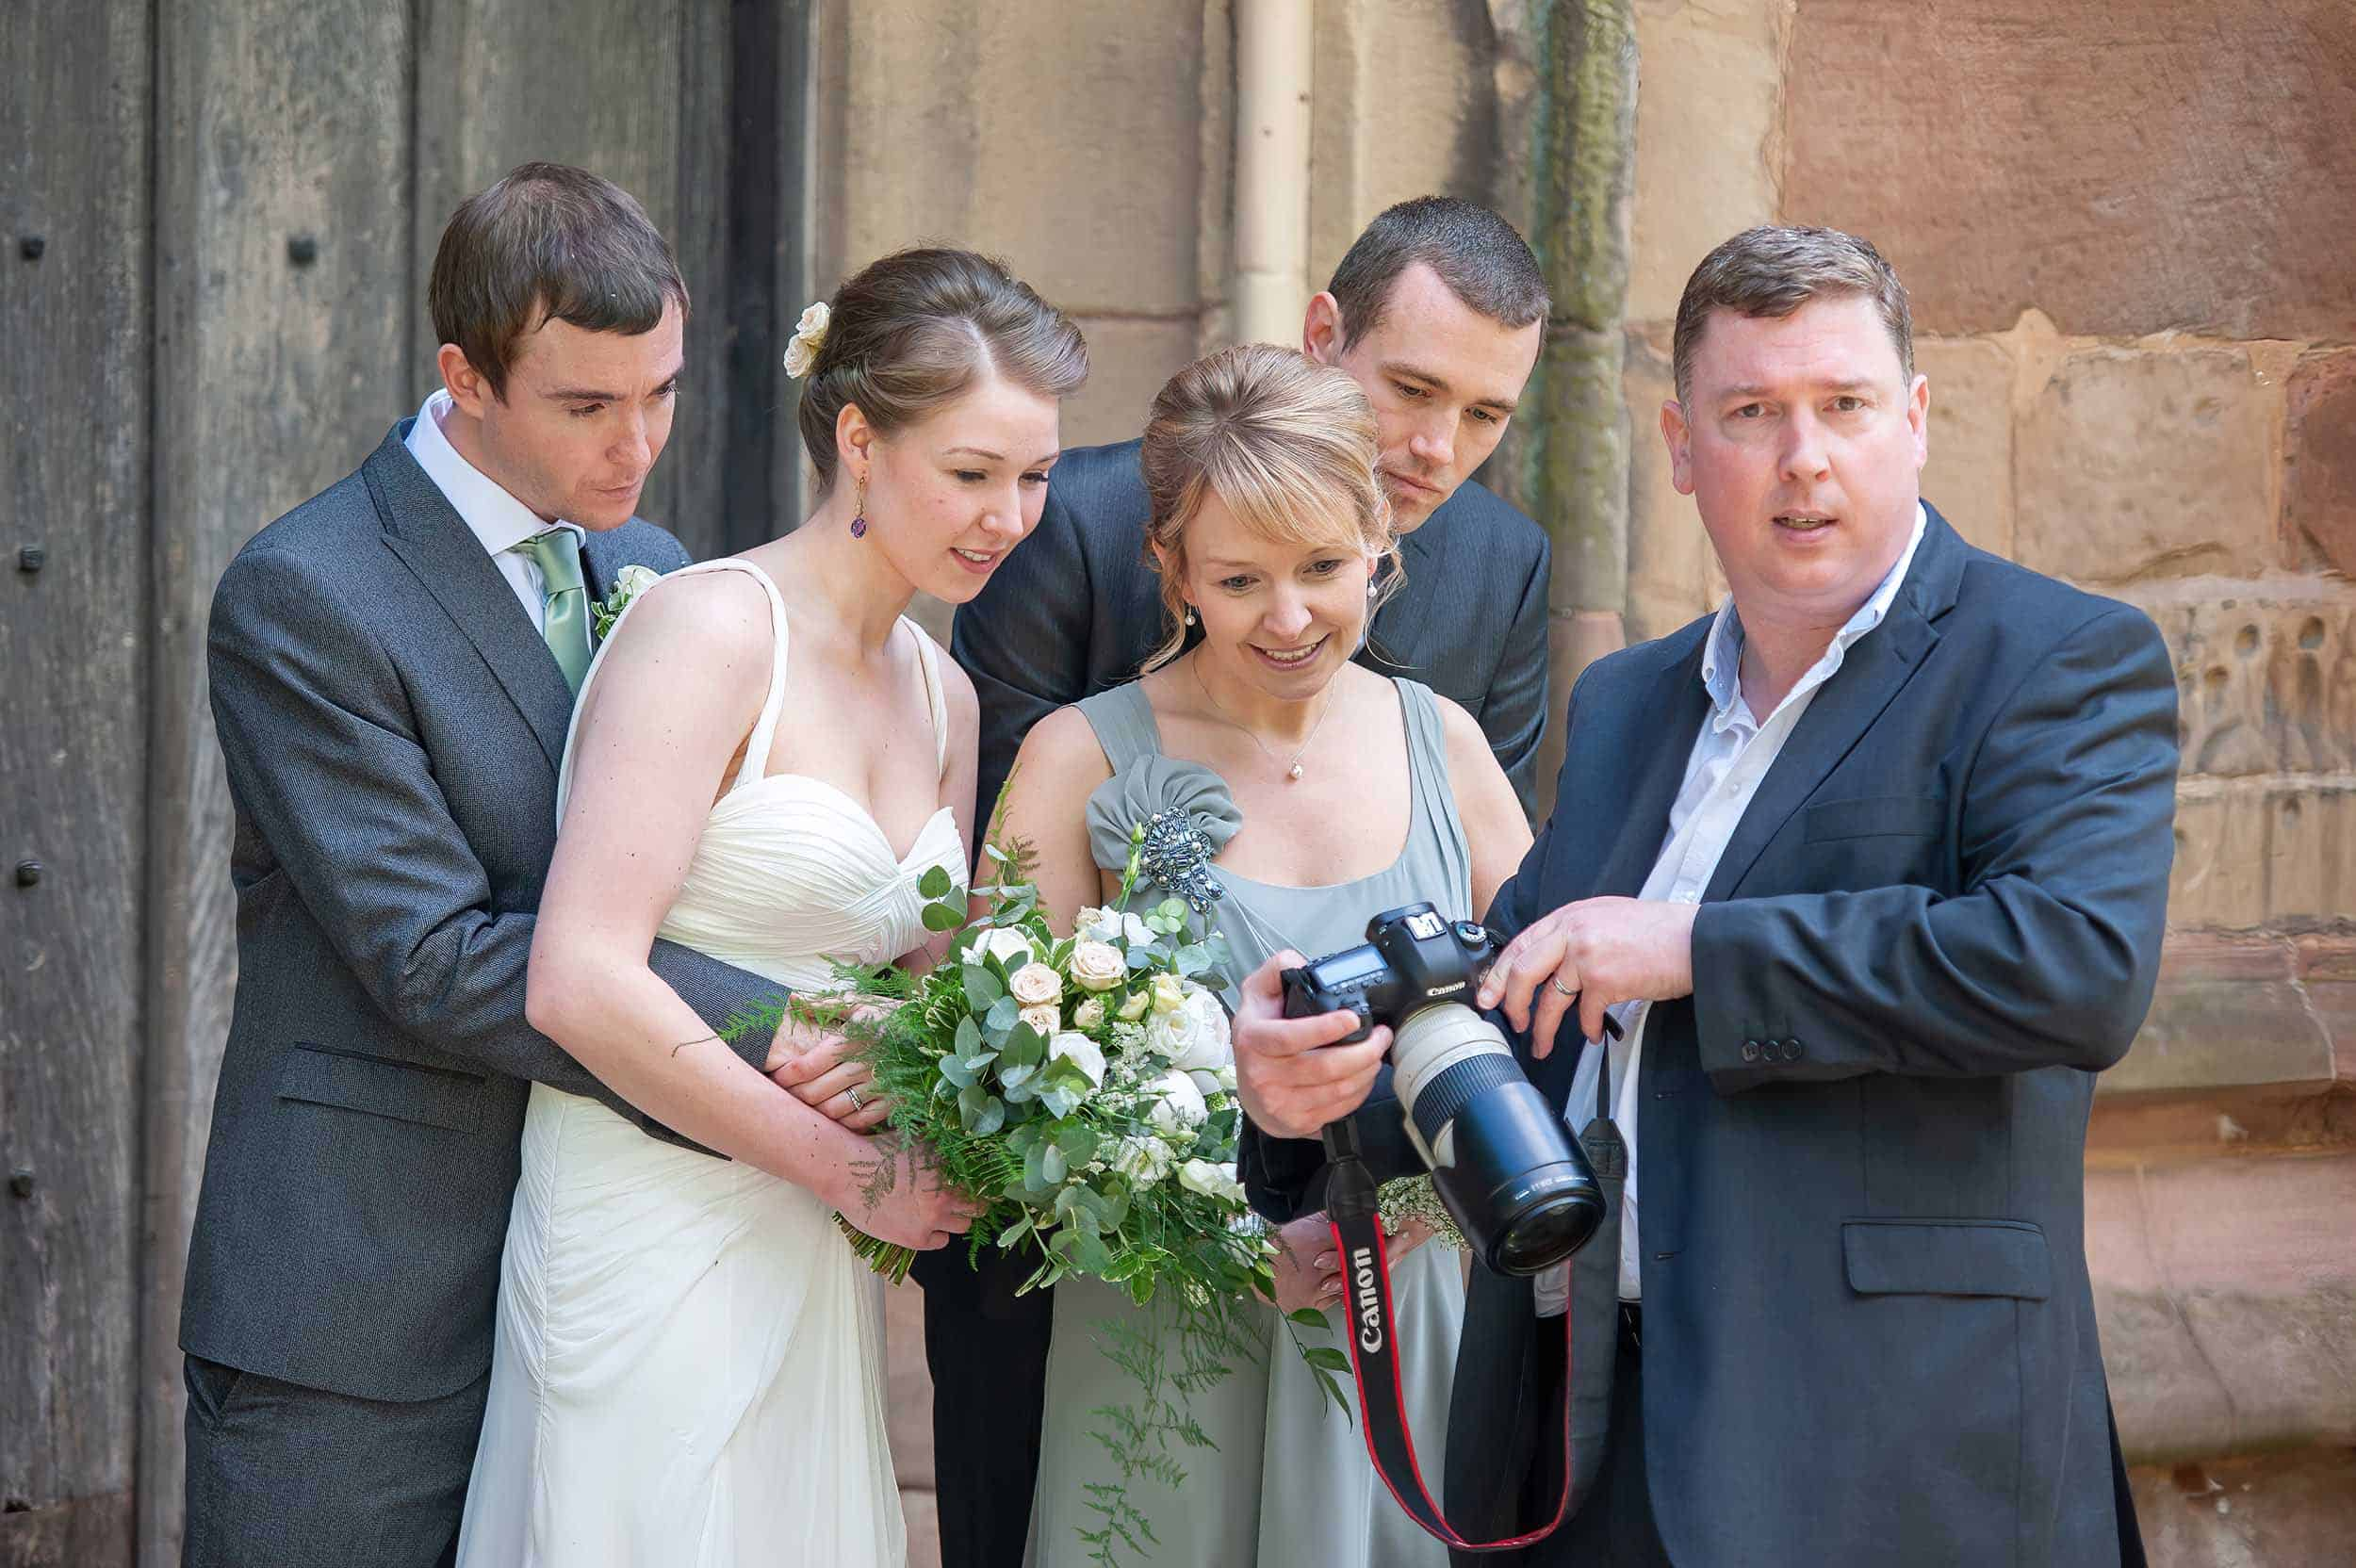 Jeff Land Wedding Photographer based in Stratford upon Avon, Warwickshire